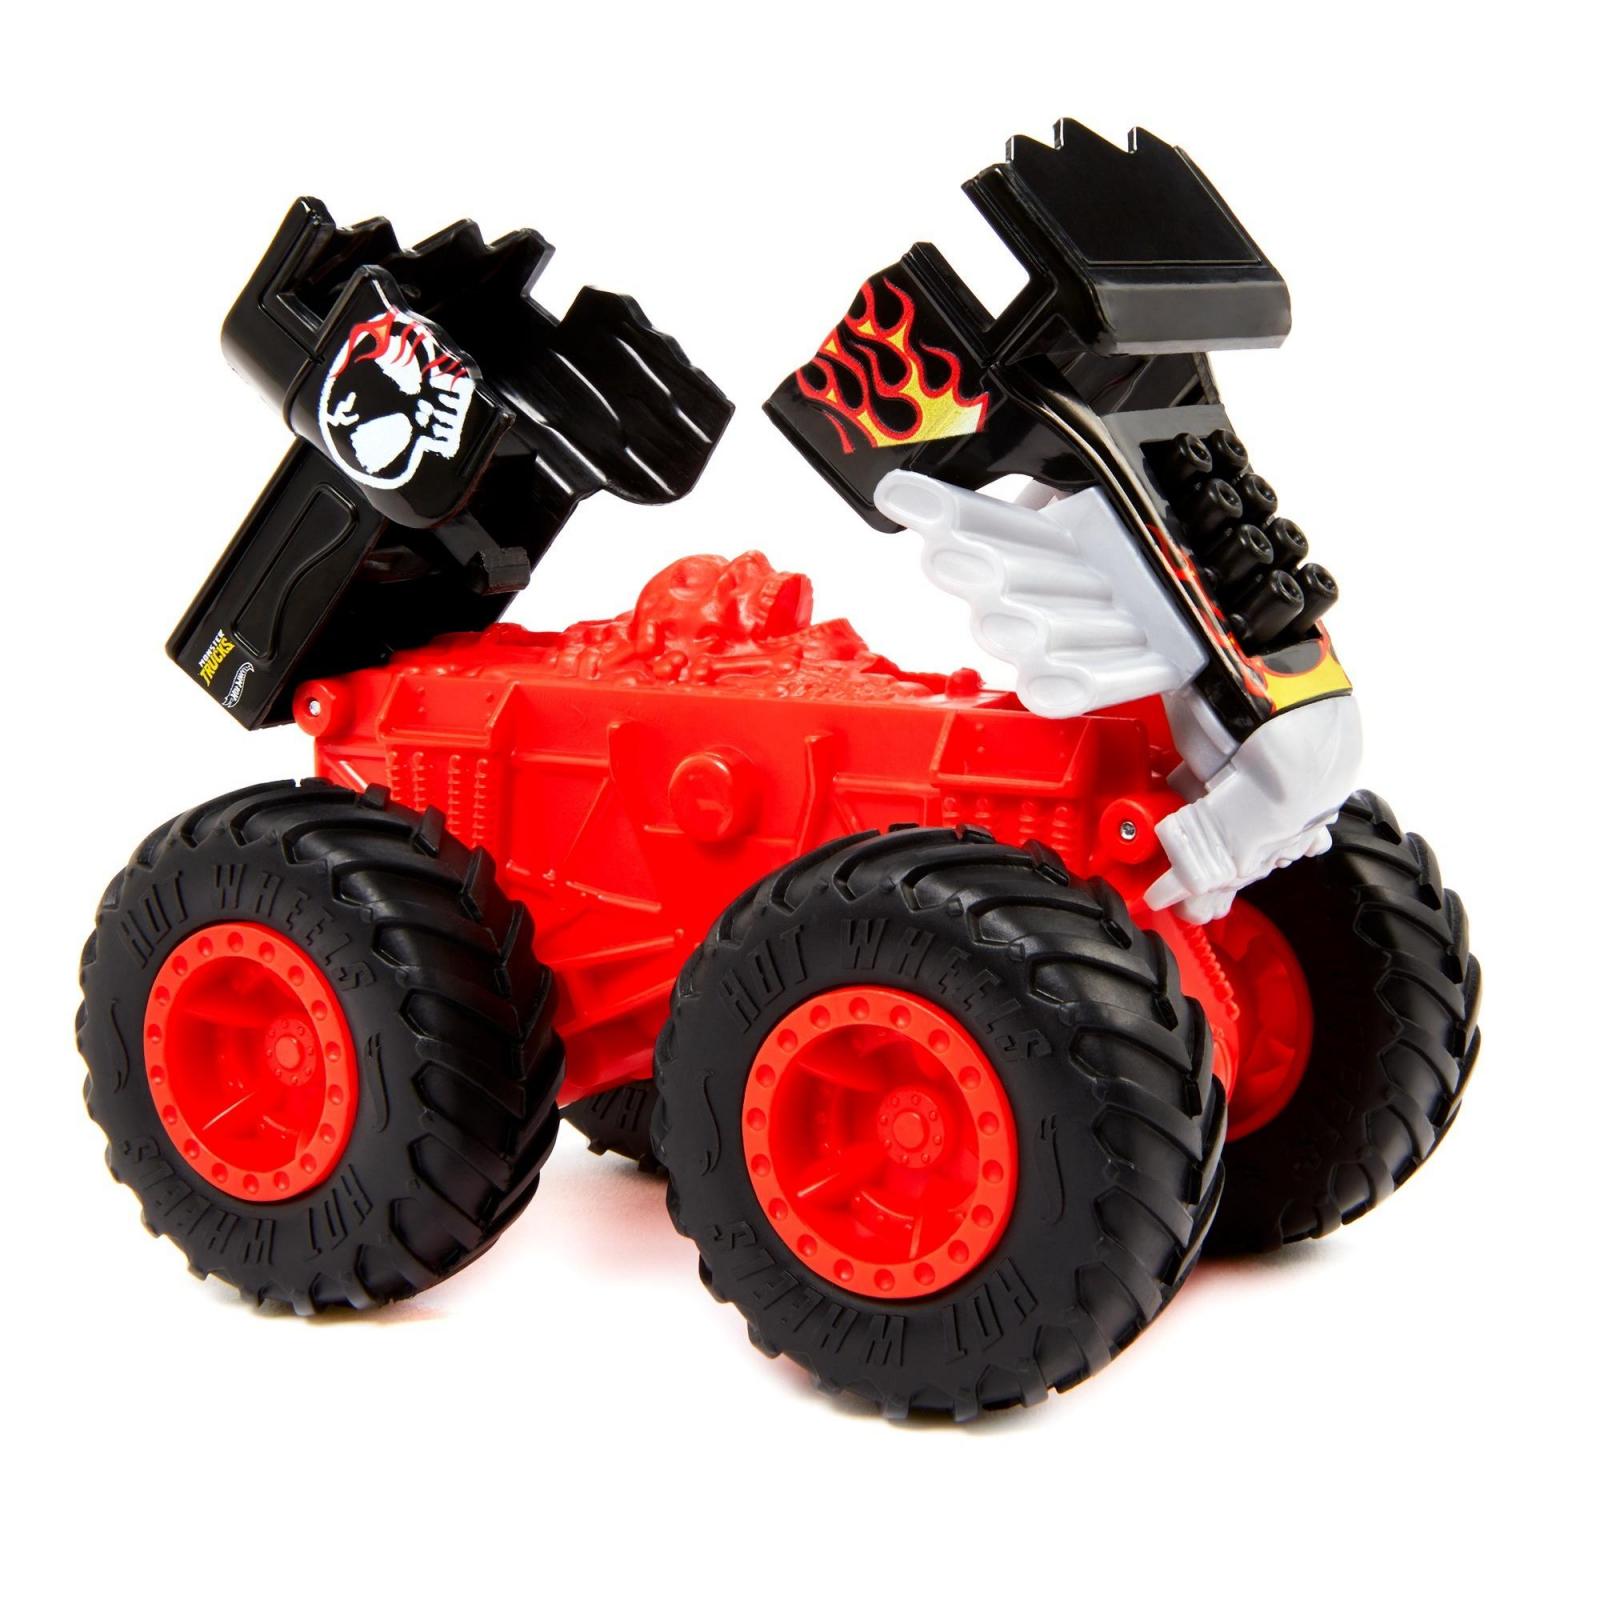 Hot Wheels Bash-Ups Monster Truck Big Wheels Bone Shaker